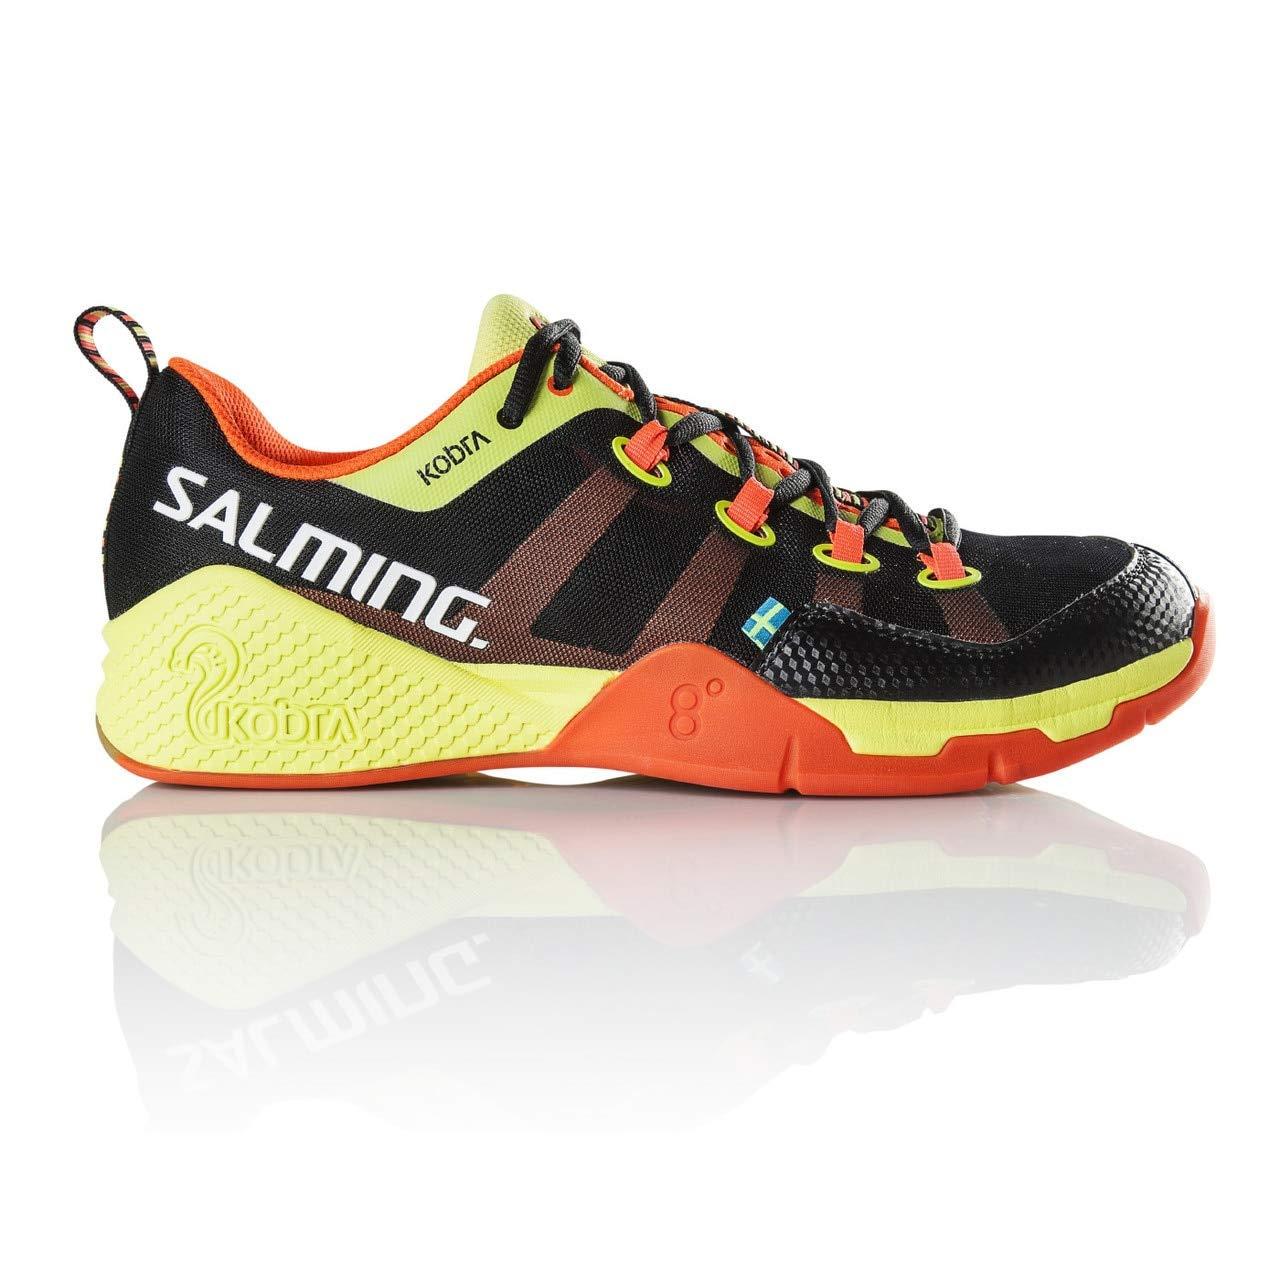 Salming Kobra Mens Squash Shoes (12.5, Black/Orange)